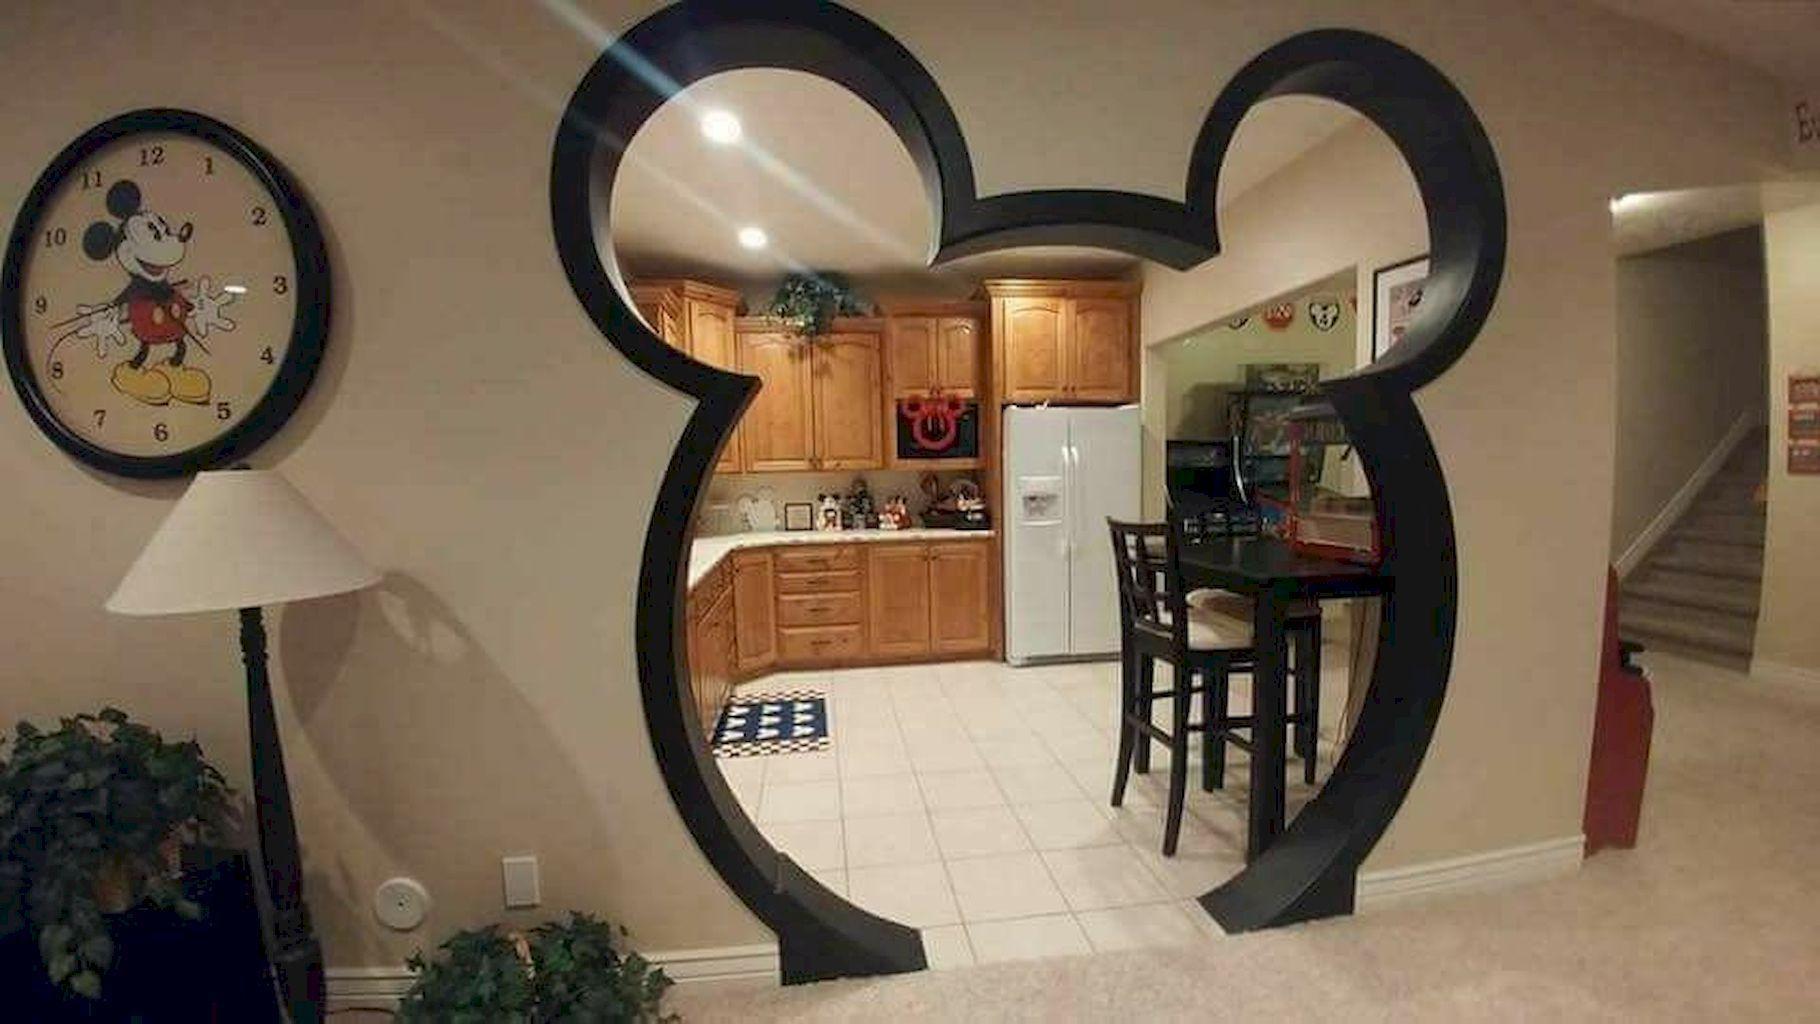 20 Diy Disney Apartment Decorations Ideas 15 Disney Home Decor Disney House Ideas Disney Room Decor